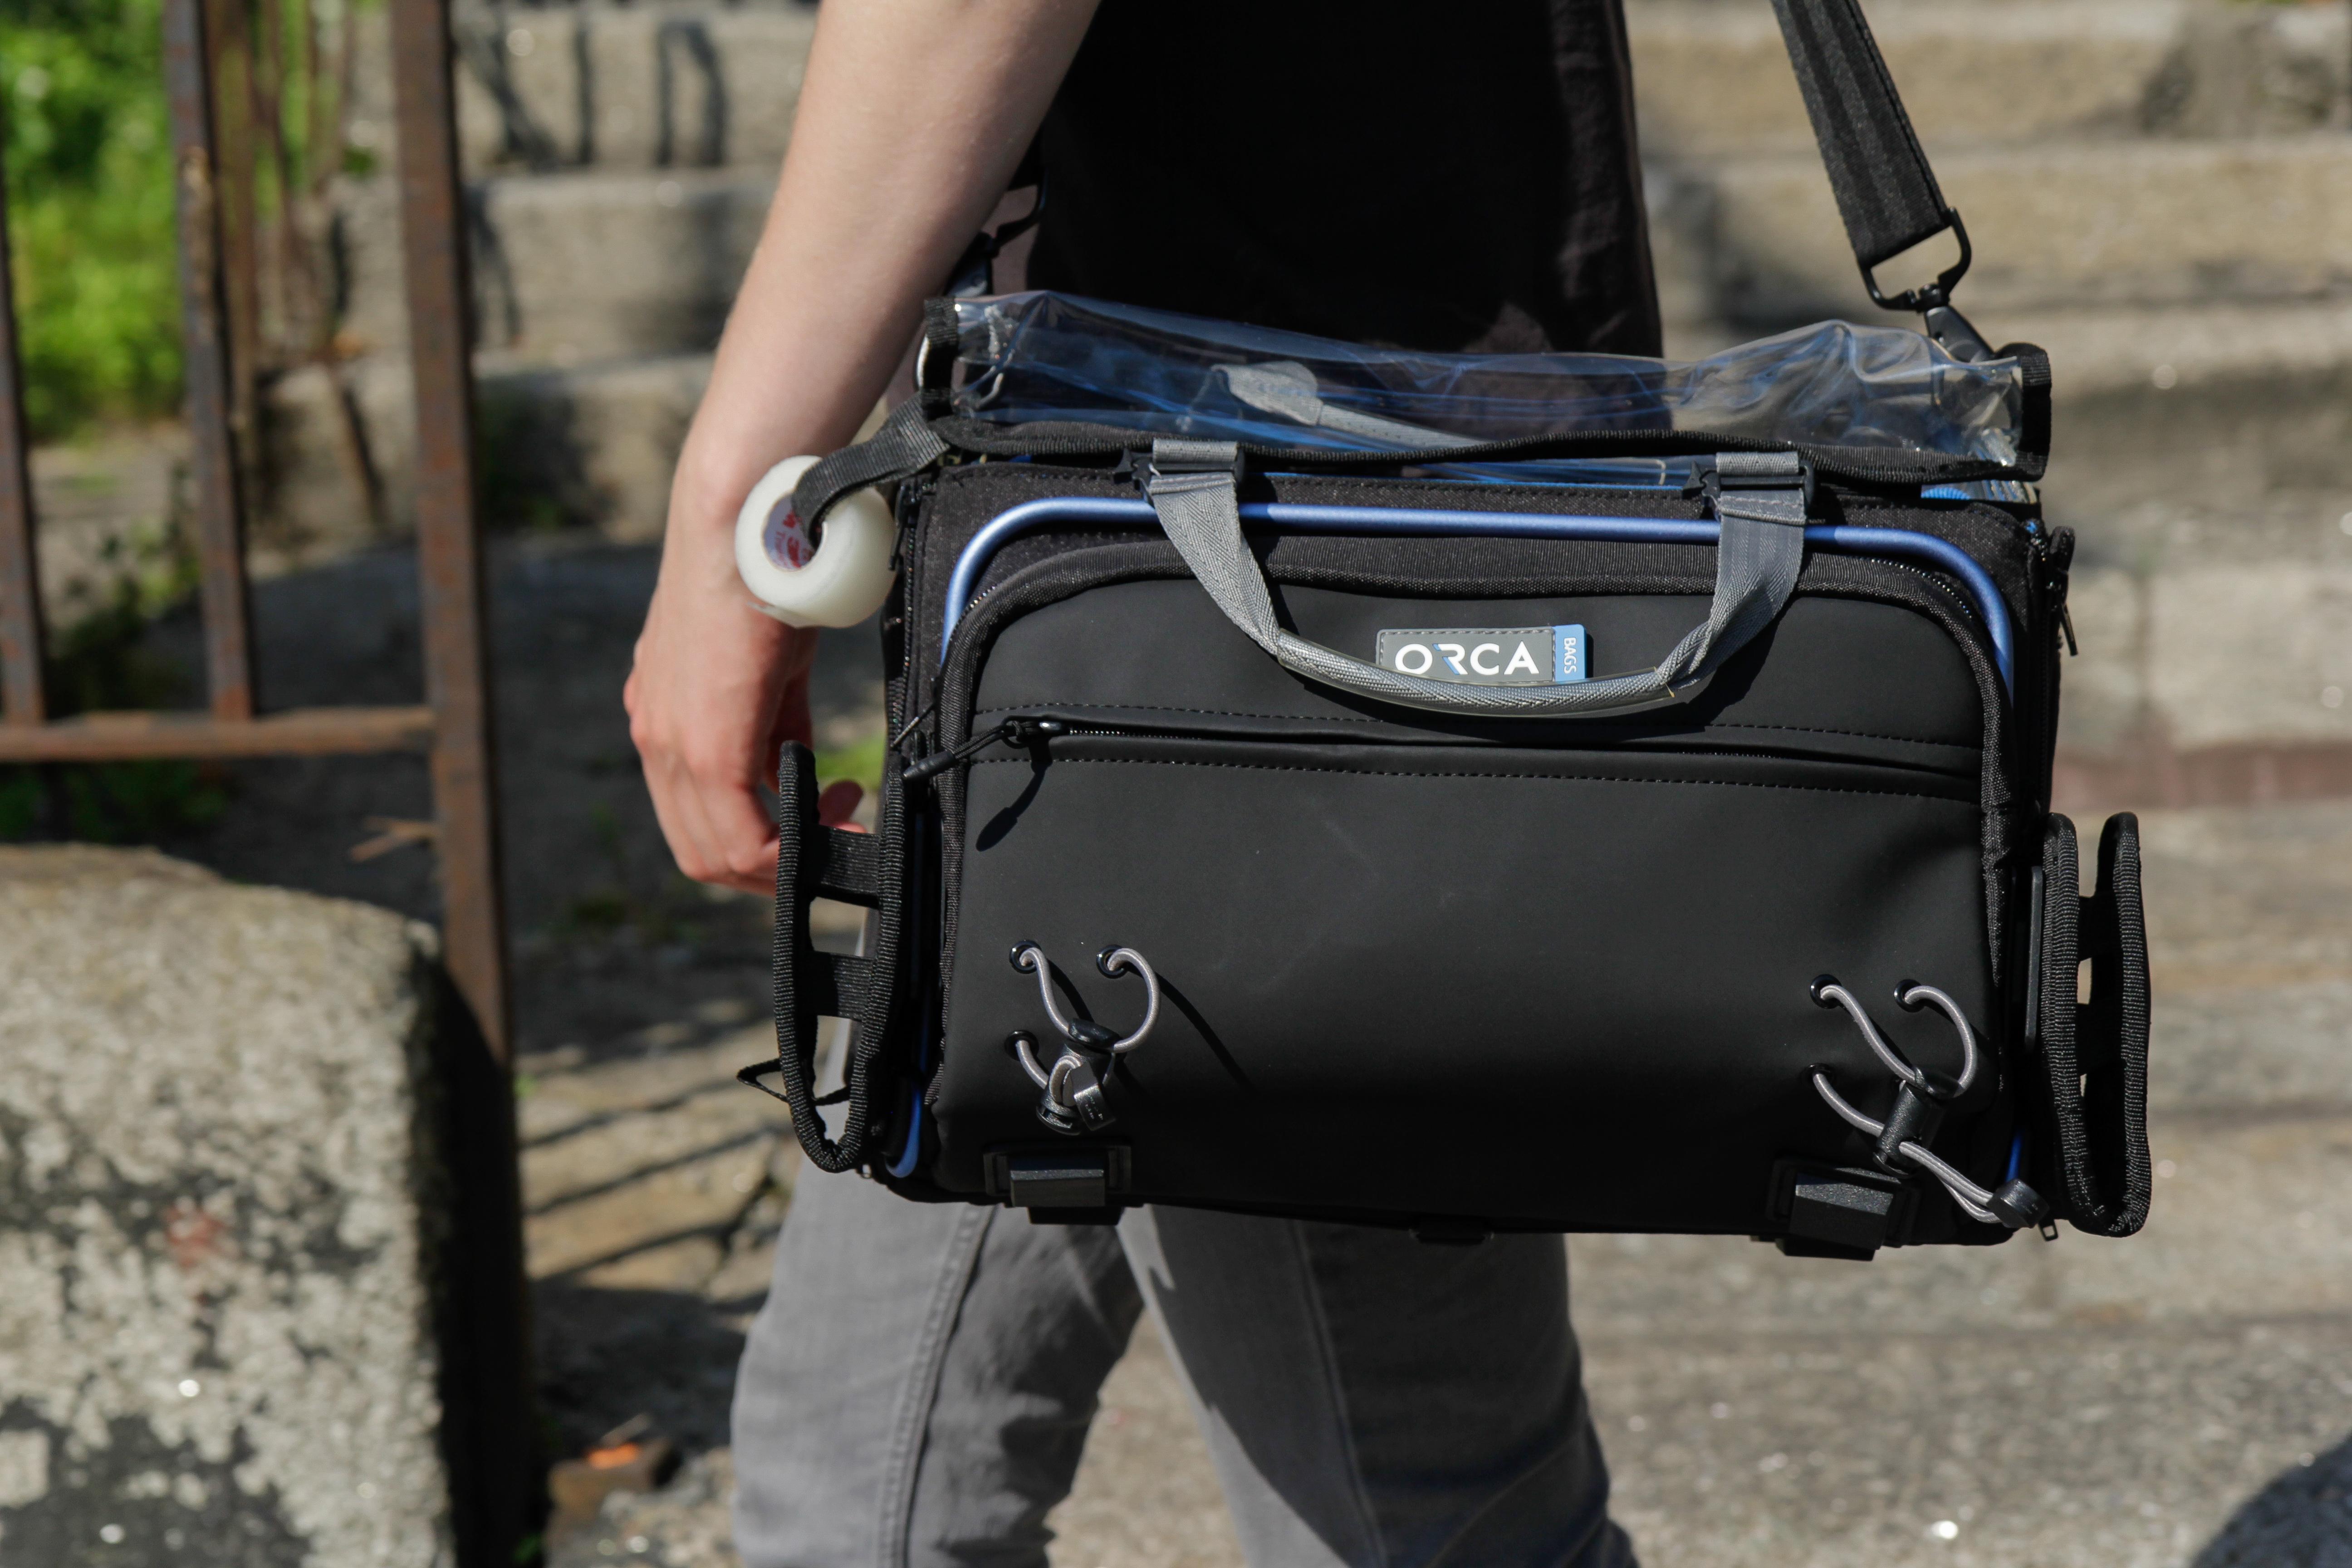 Orca-OR 32 Mixer Bag